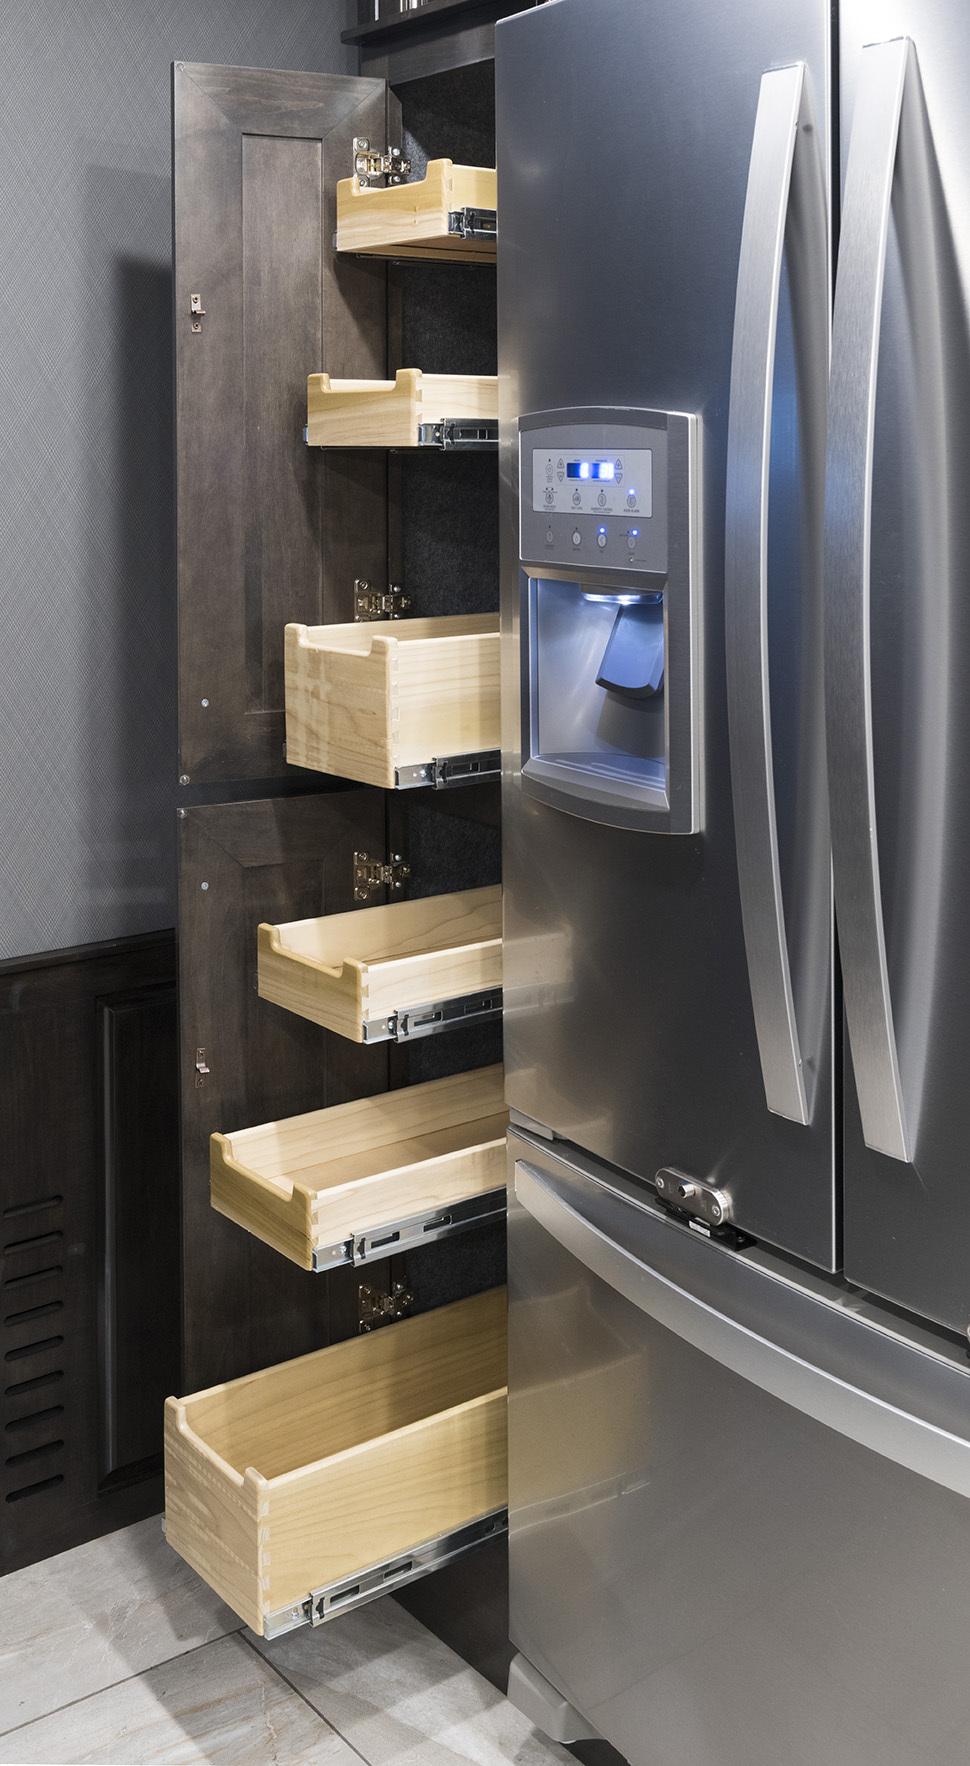 6 pantry 42 V REV Silverston Dorian1728